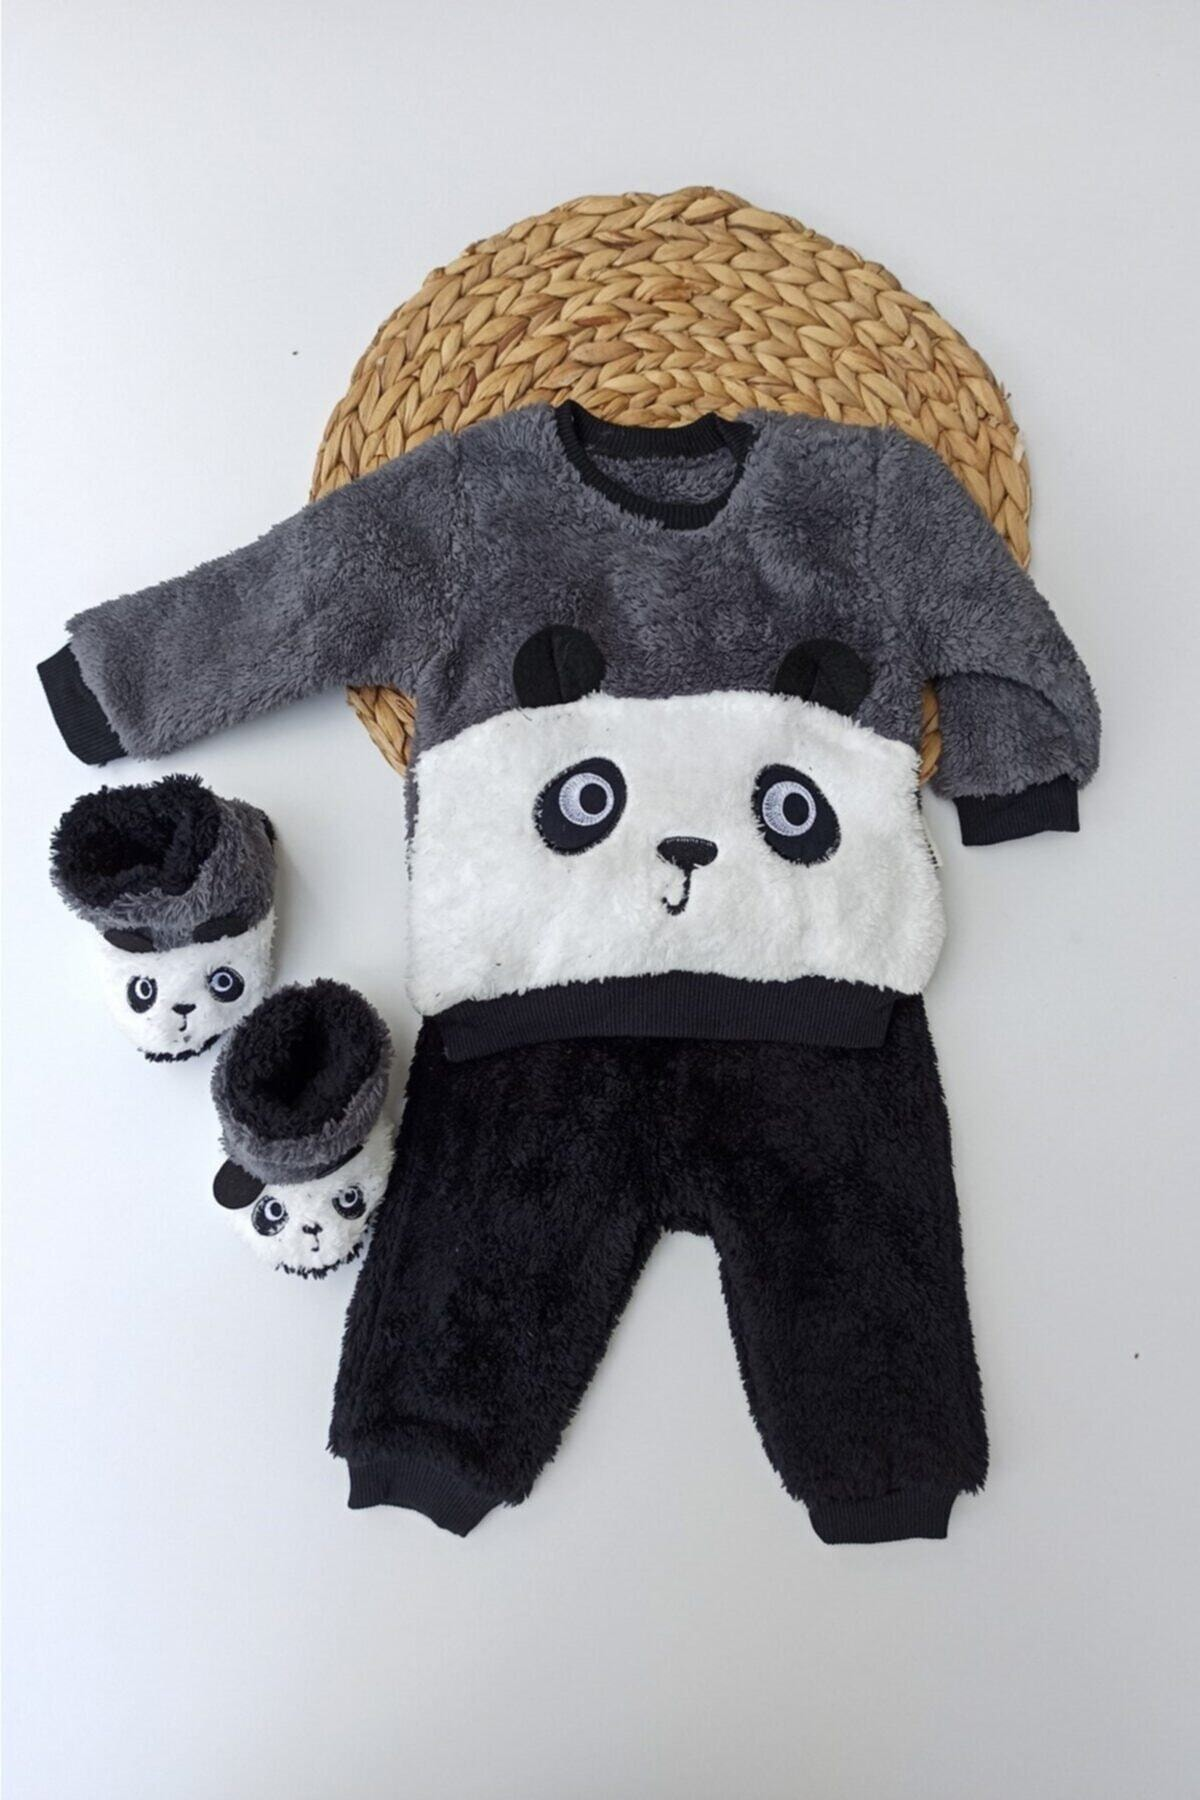 Necix Unisex Gri Panda Desenli Kışlık Welsoft Panduflu Lüx Bebek Takımı 6-9-12 Ay 1